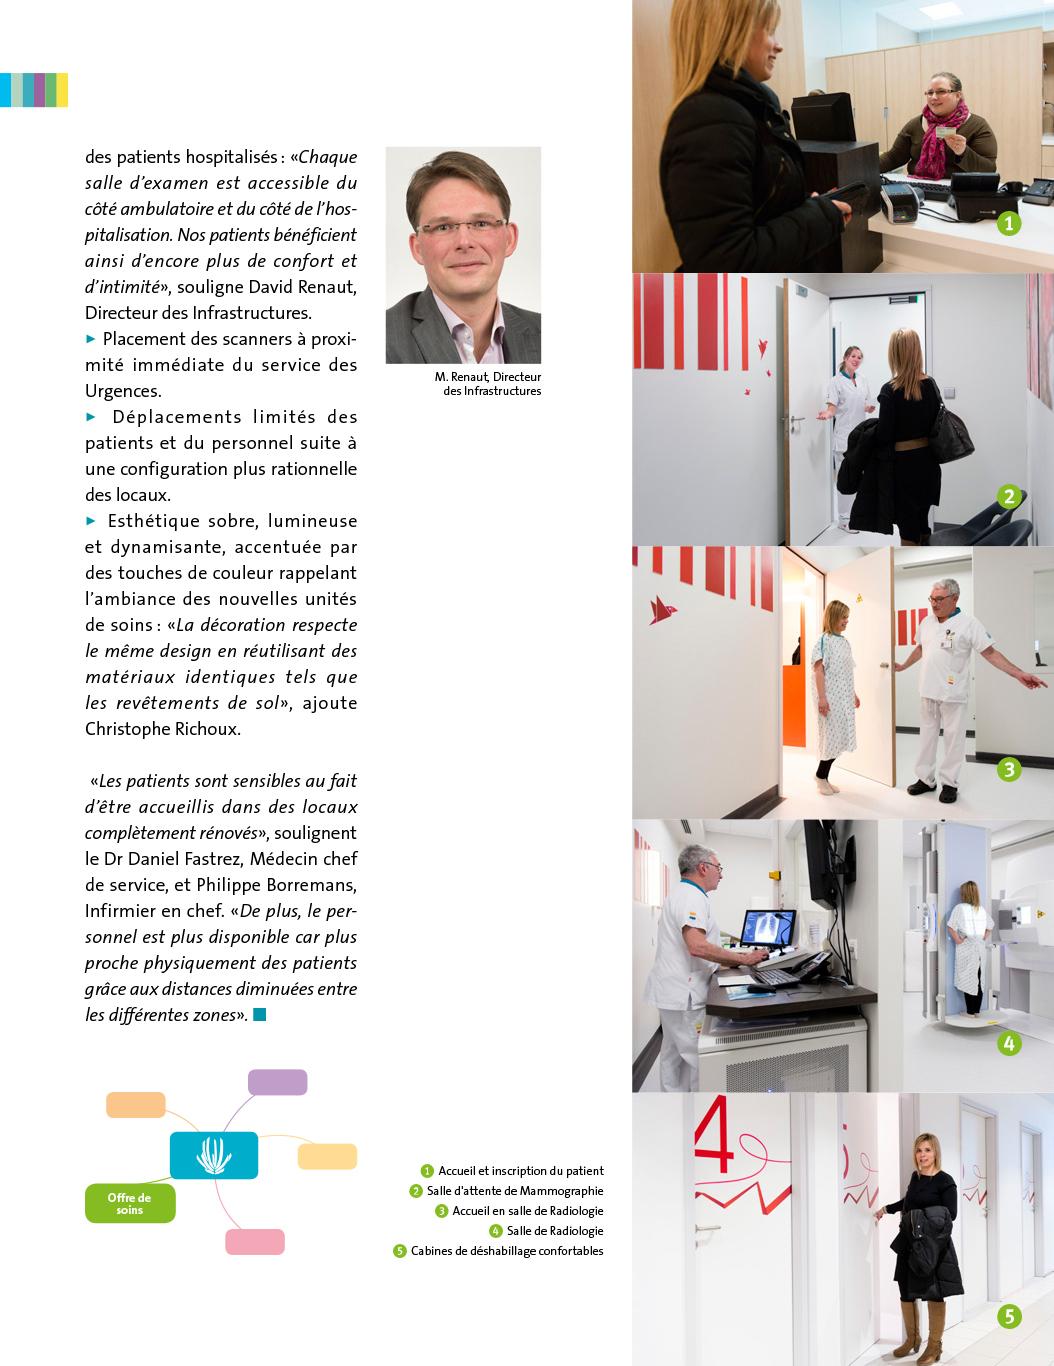 cndg_rapportactivites_2015_extrait_radiologie-2